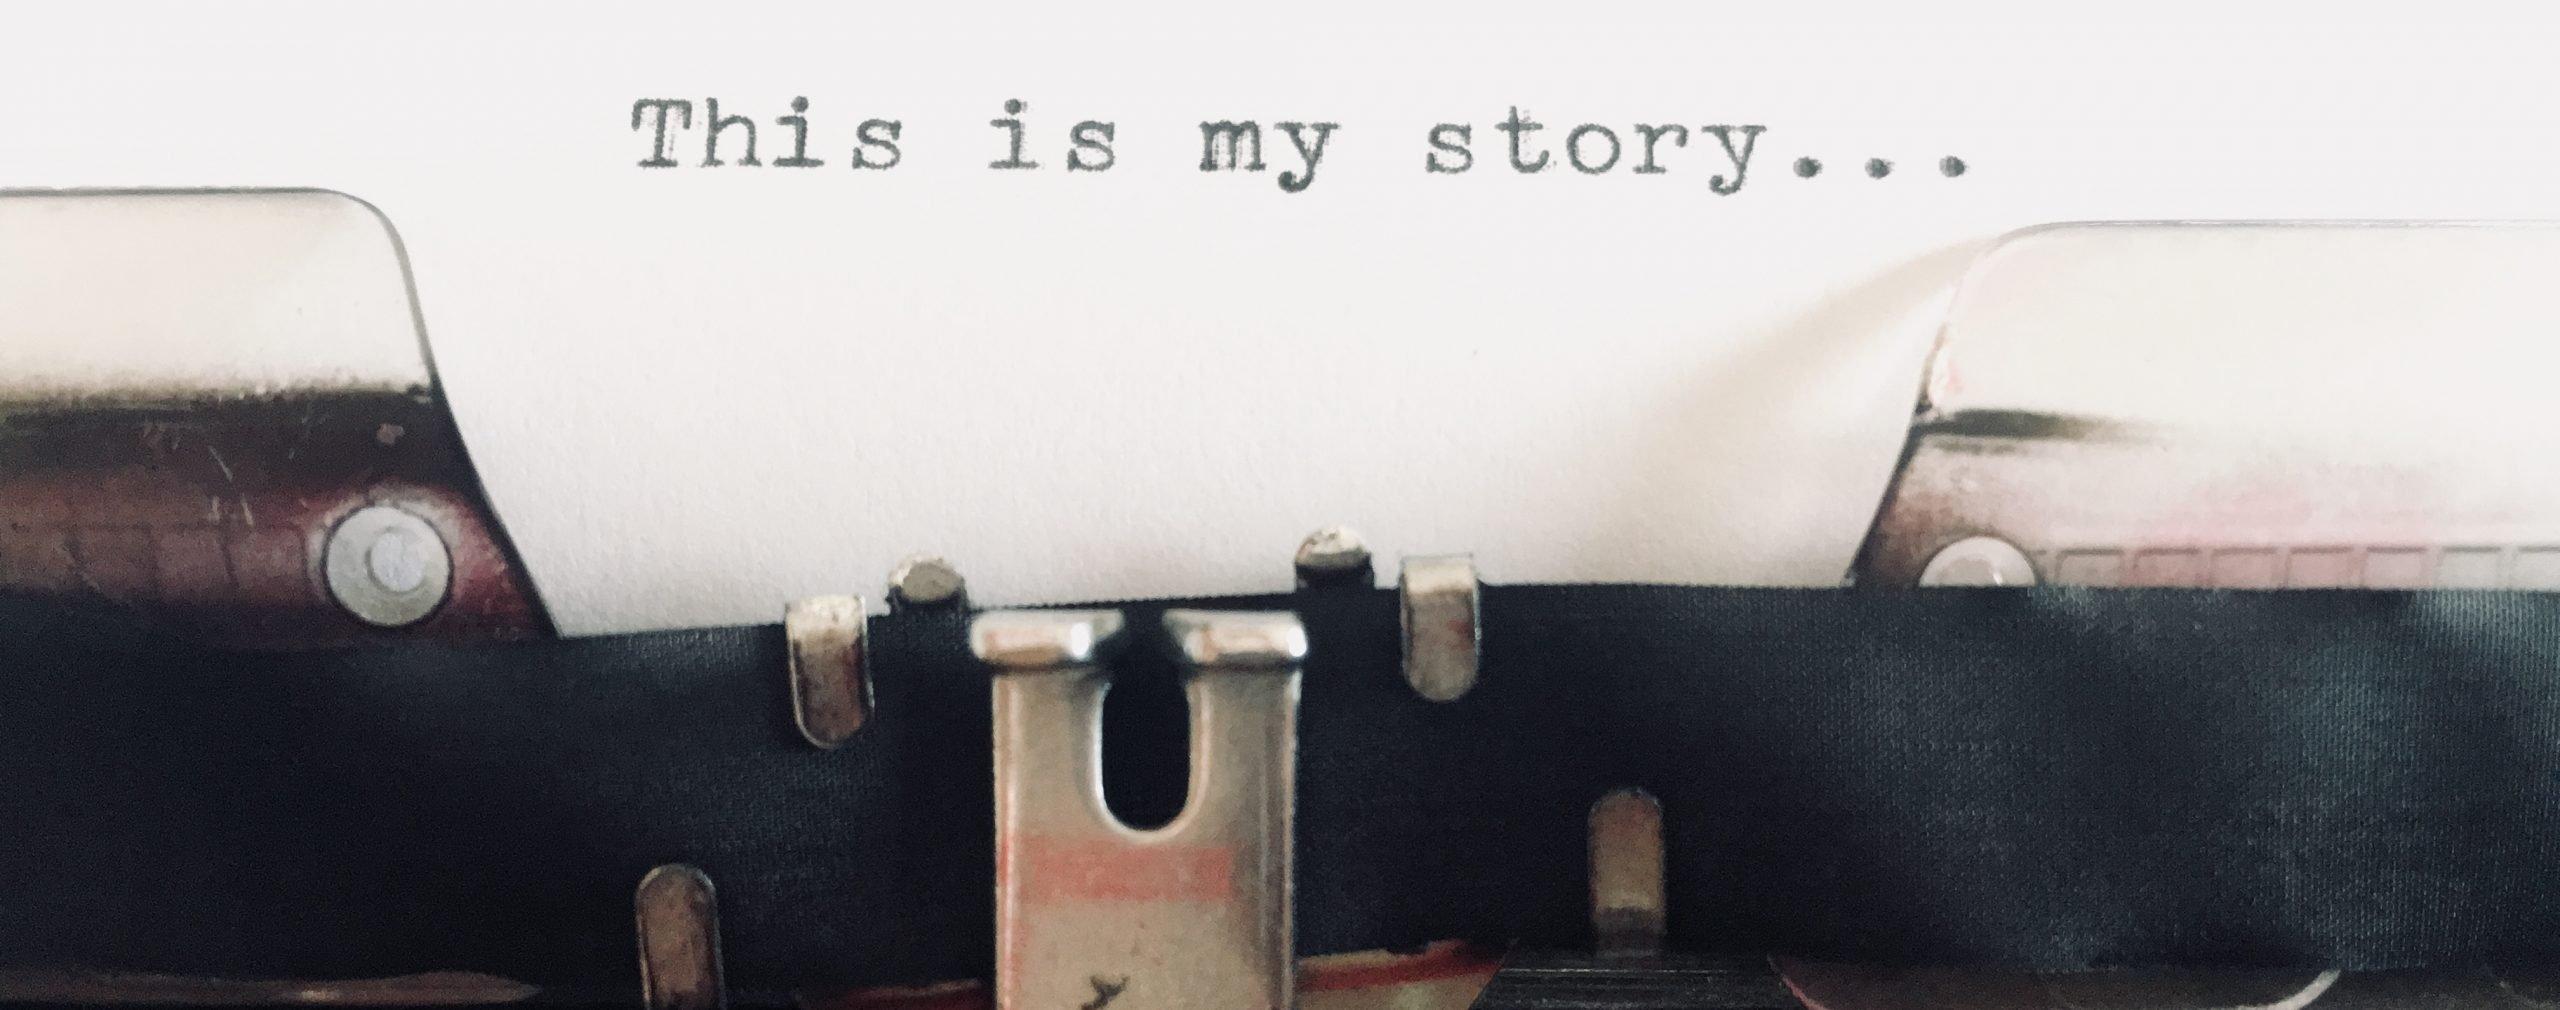 Storylines Web